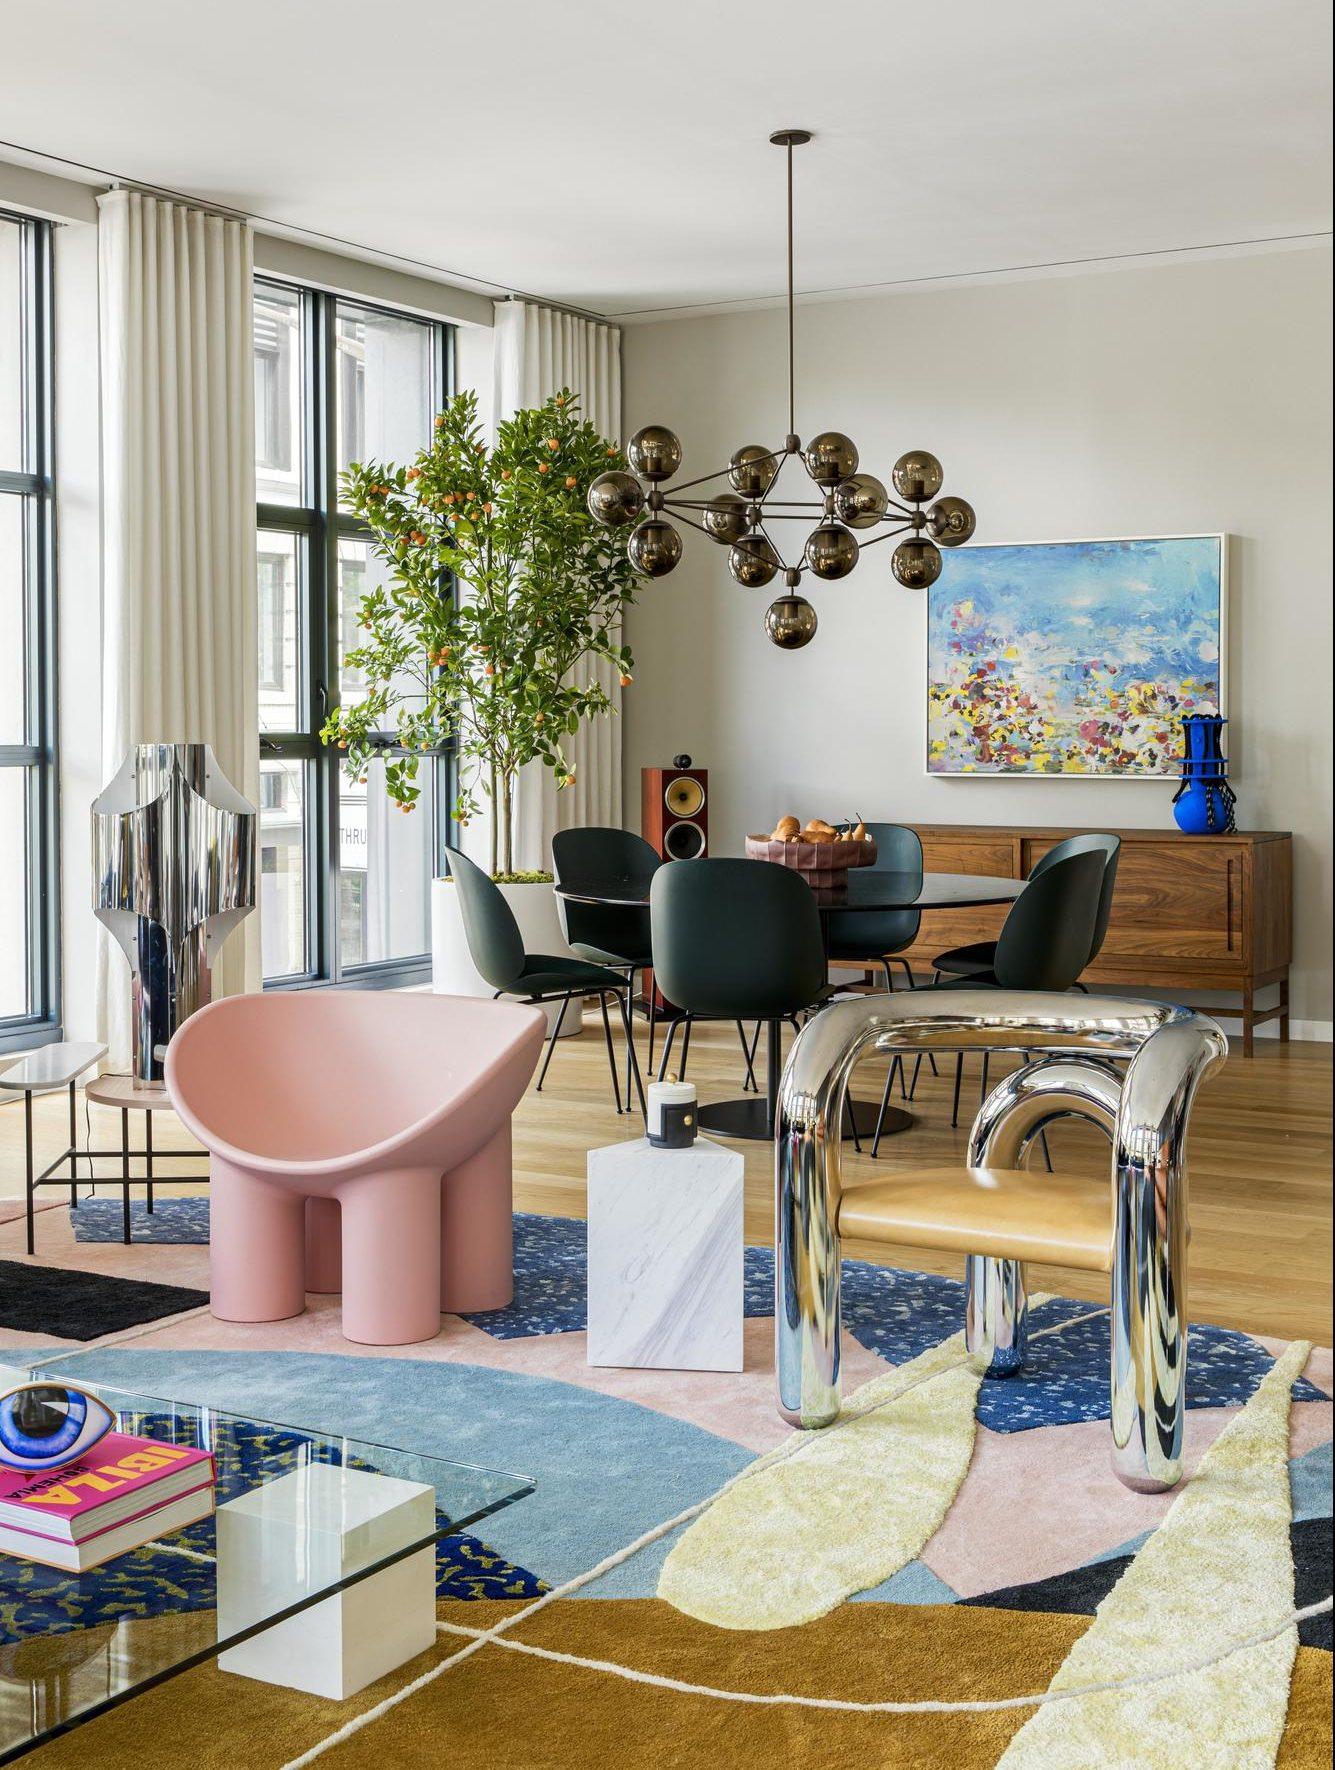 alexproba_designerin-decohomde-apartment-teppich